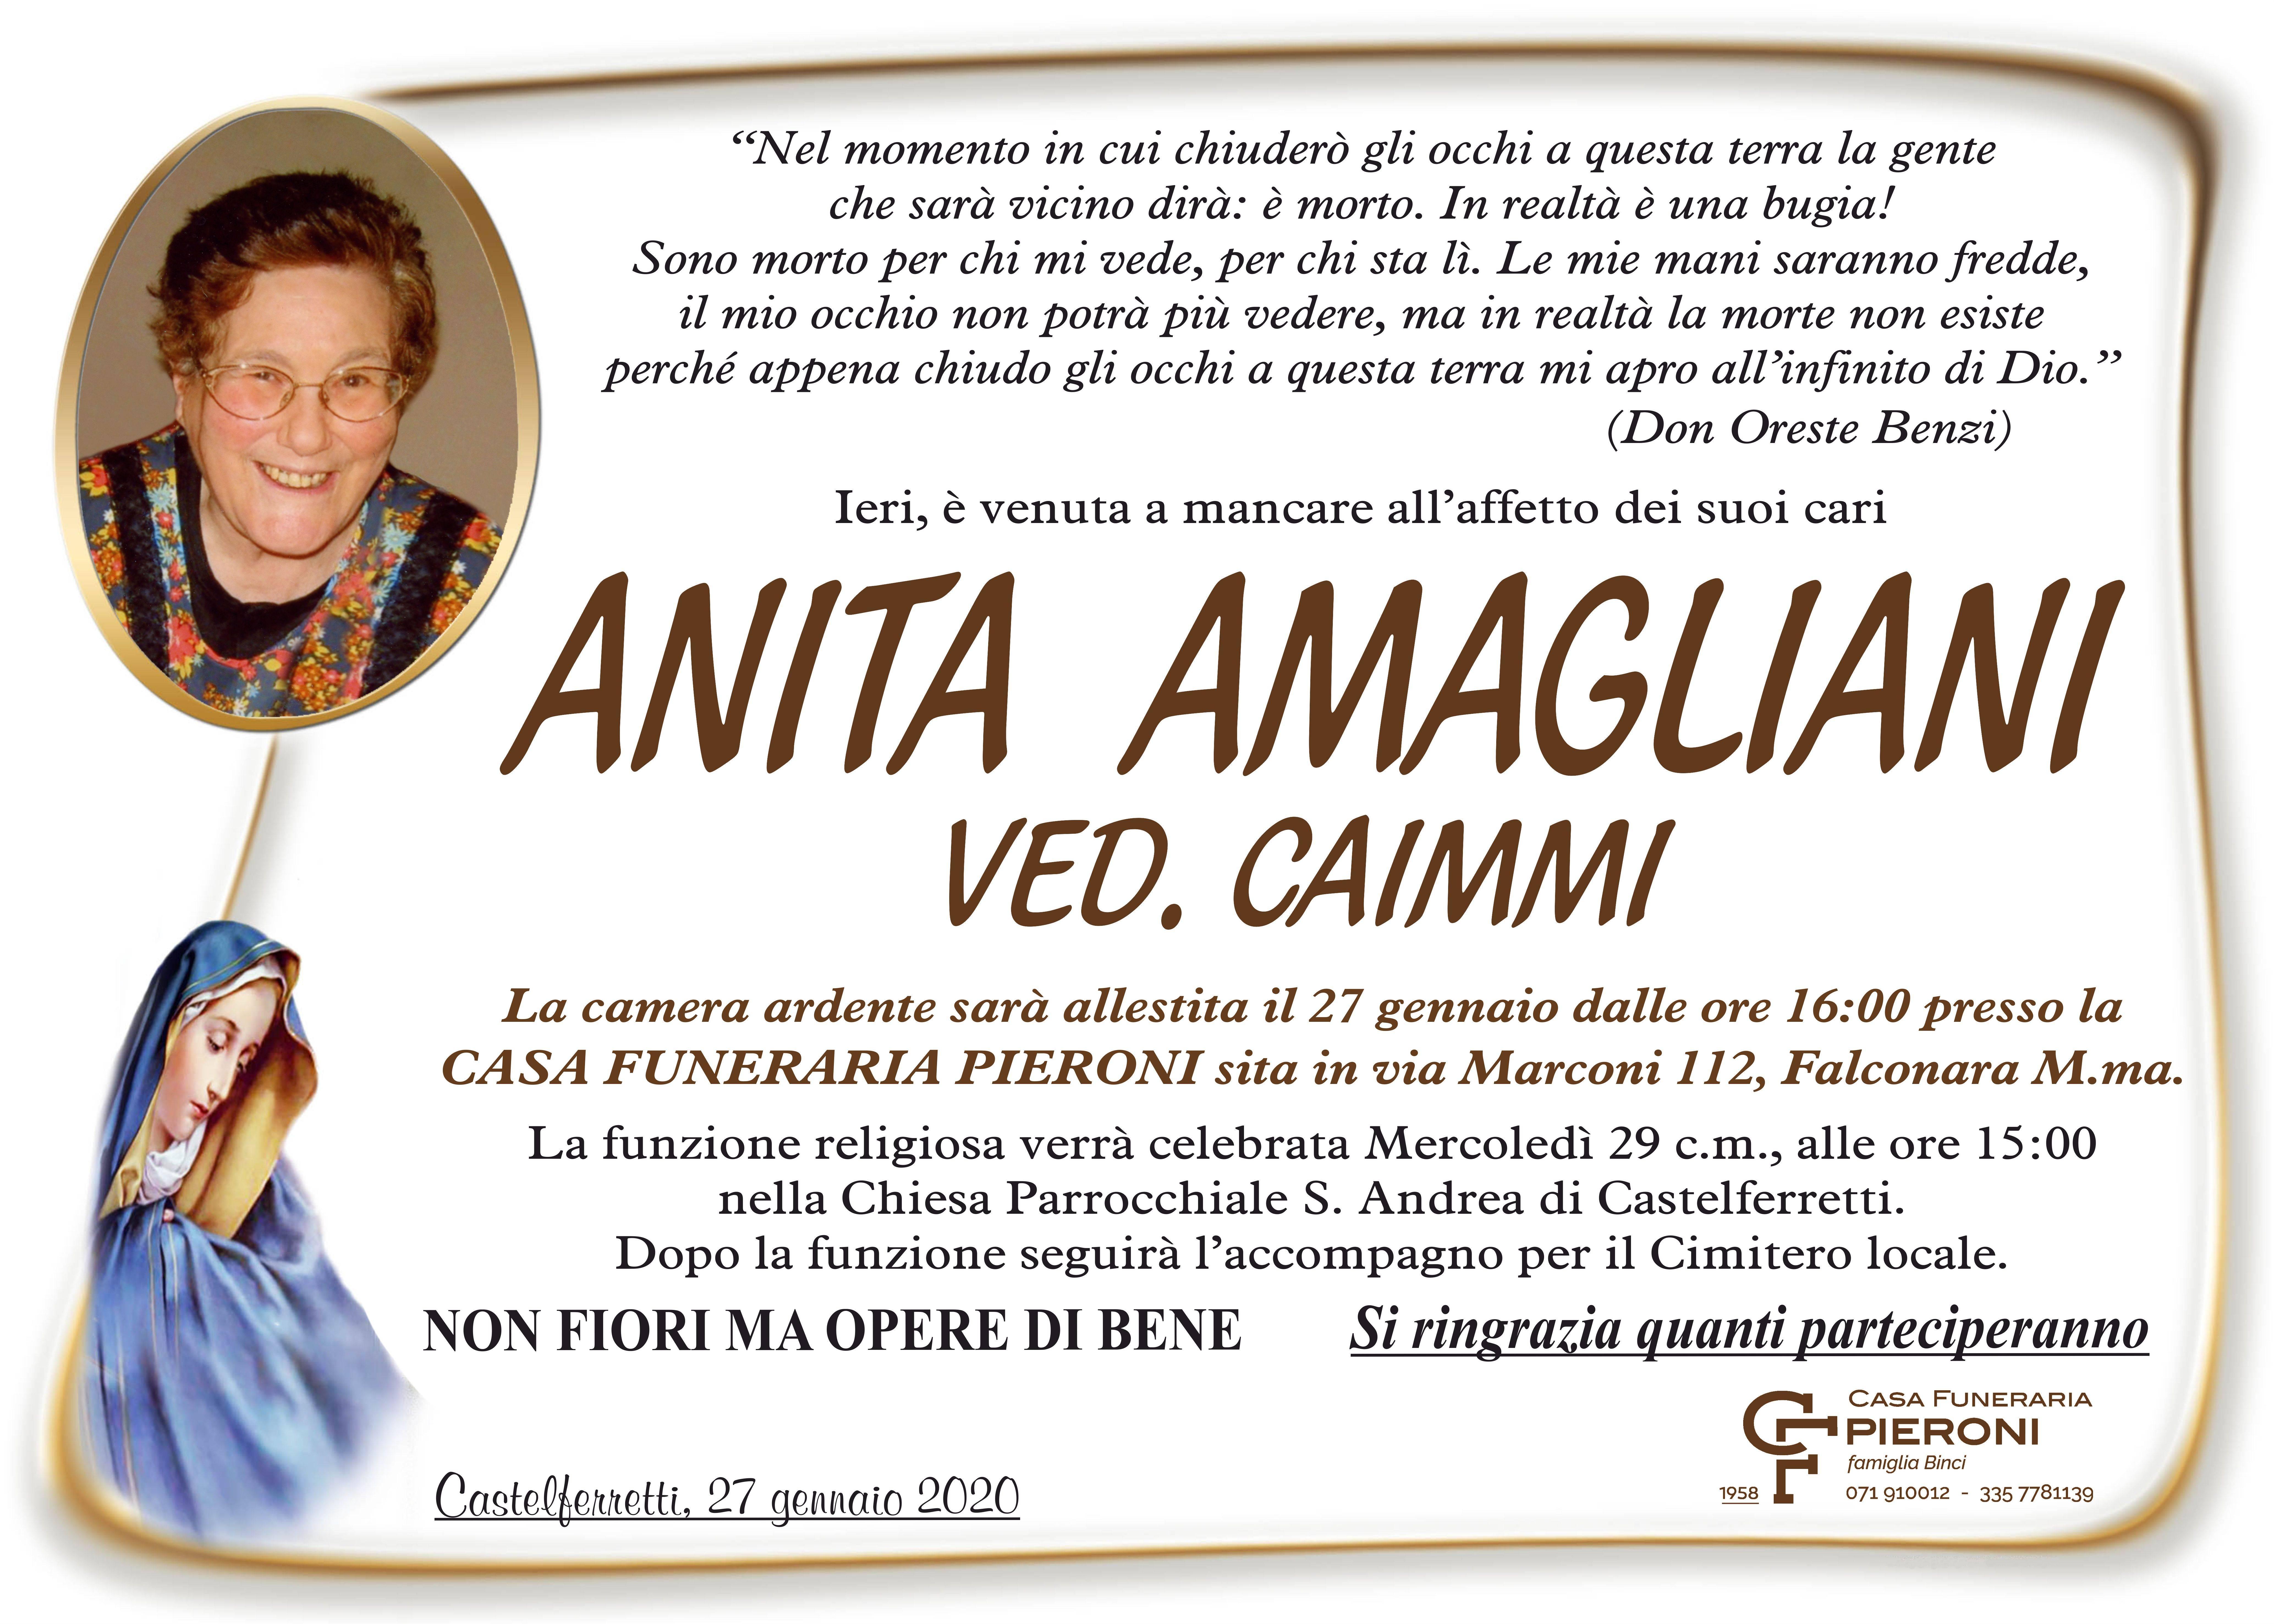 Anita Amagliani